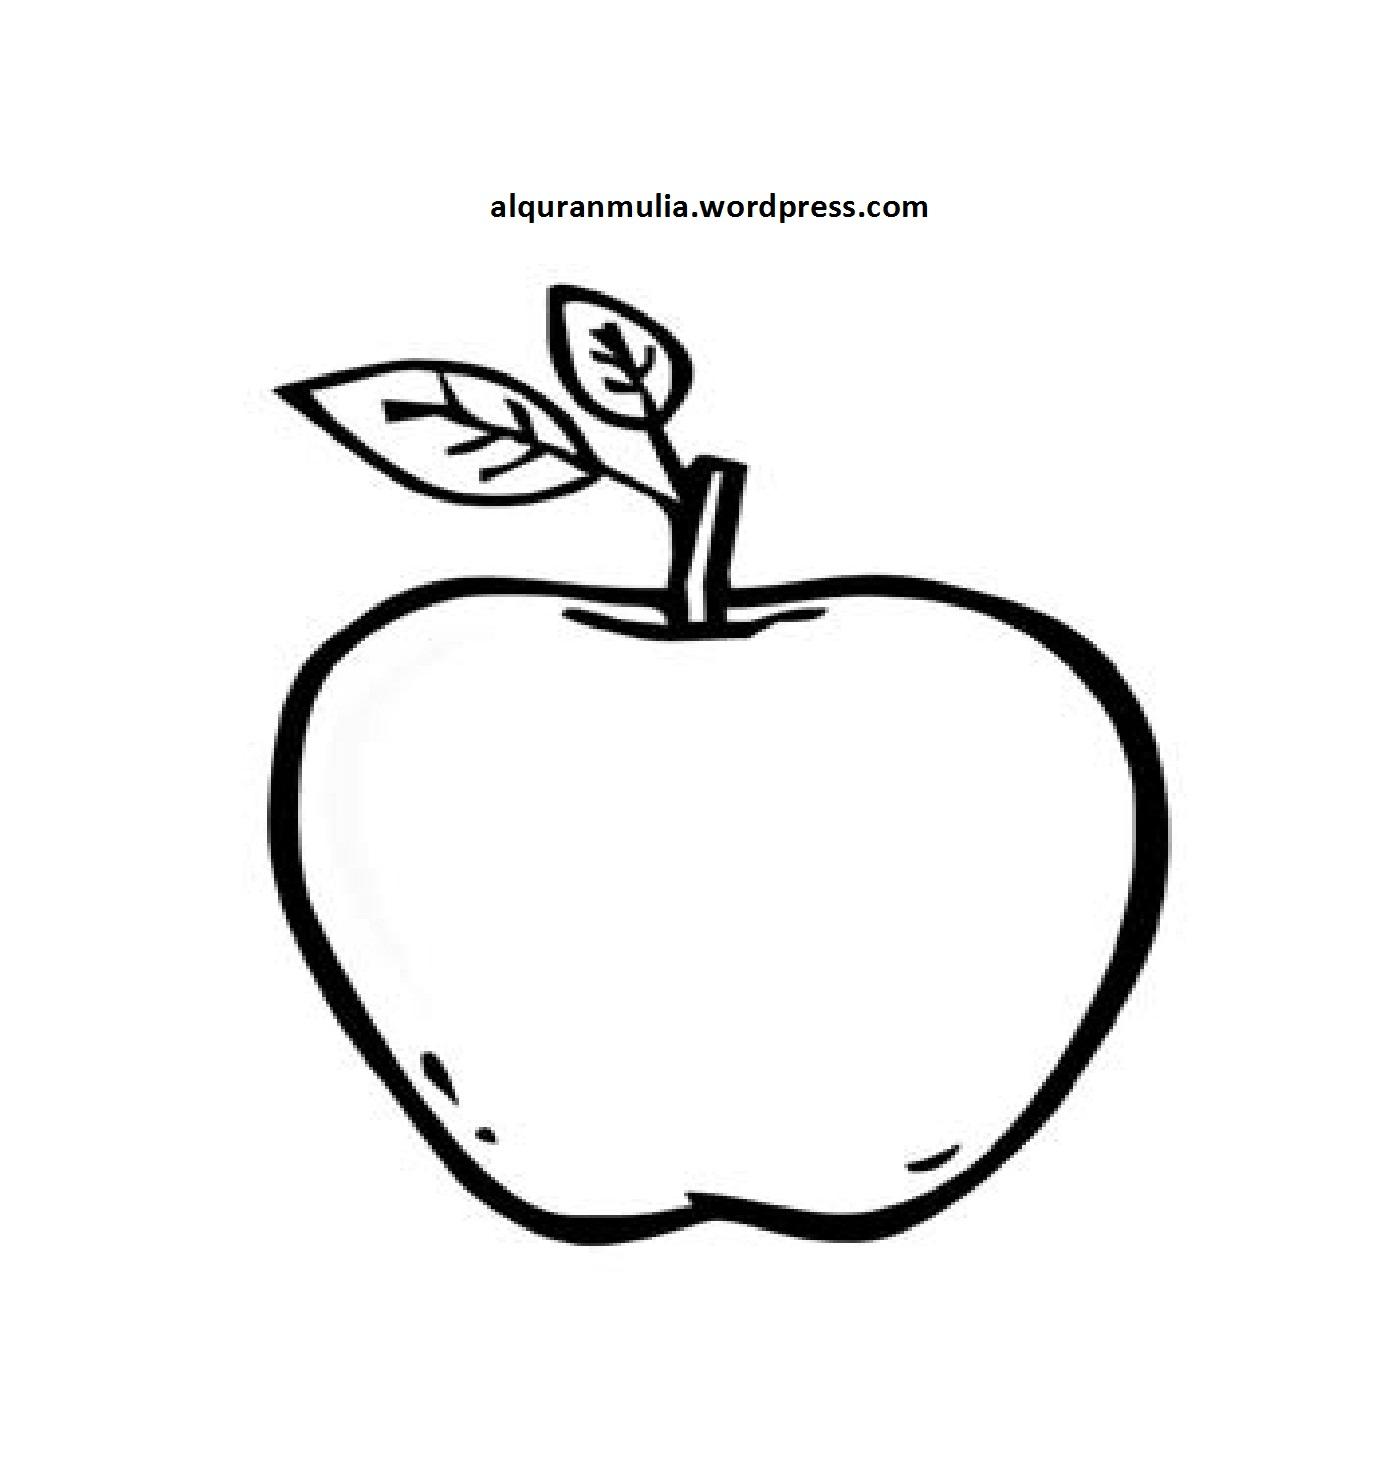 Mewarnai gambar buah apel anak muslim